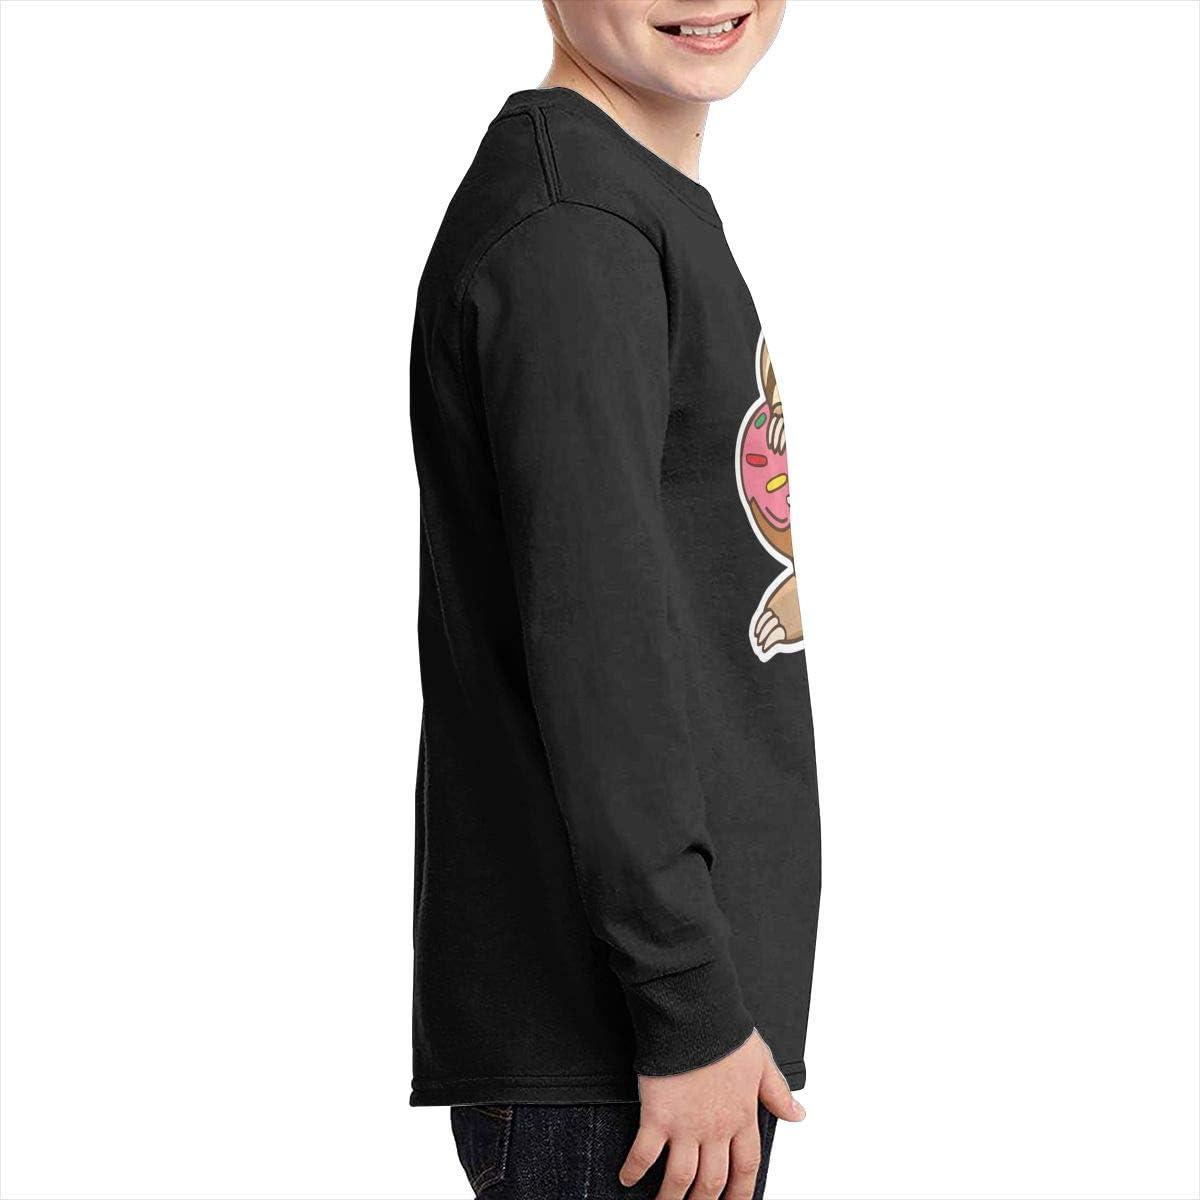 CERTONGCXTS Teen Sloth Donut ComfortSoft Long Sleeve T-Shirt